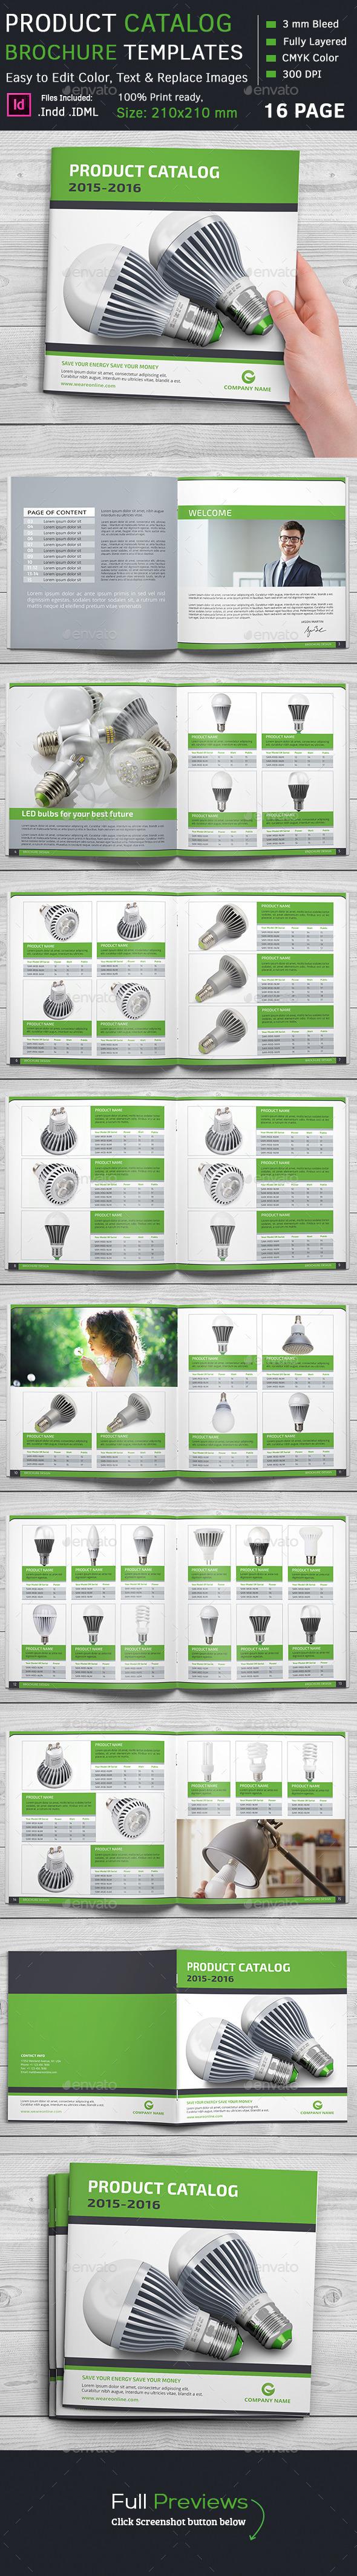 Product Catalog Square Brochure - Catalogs Brochures